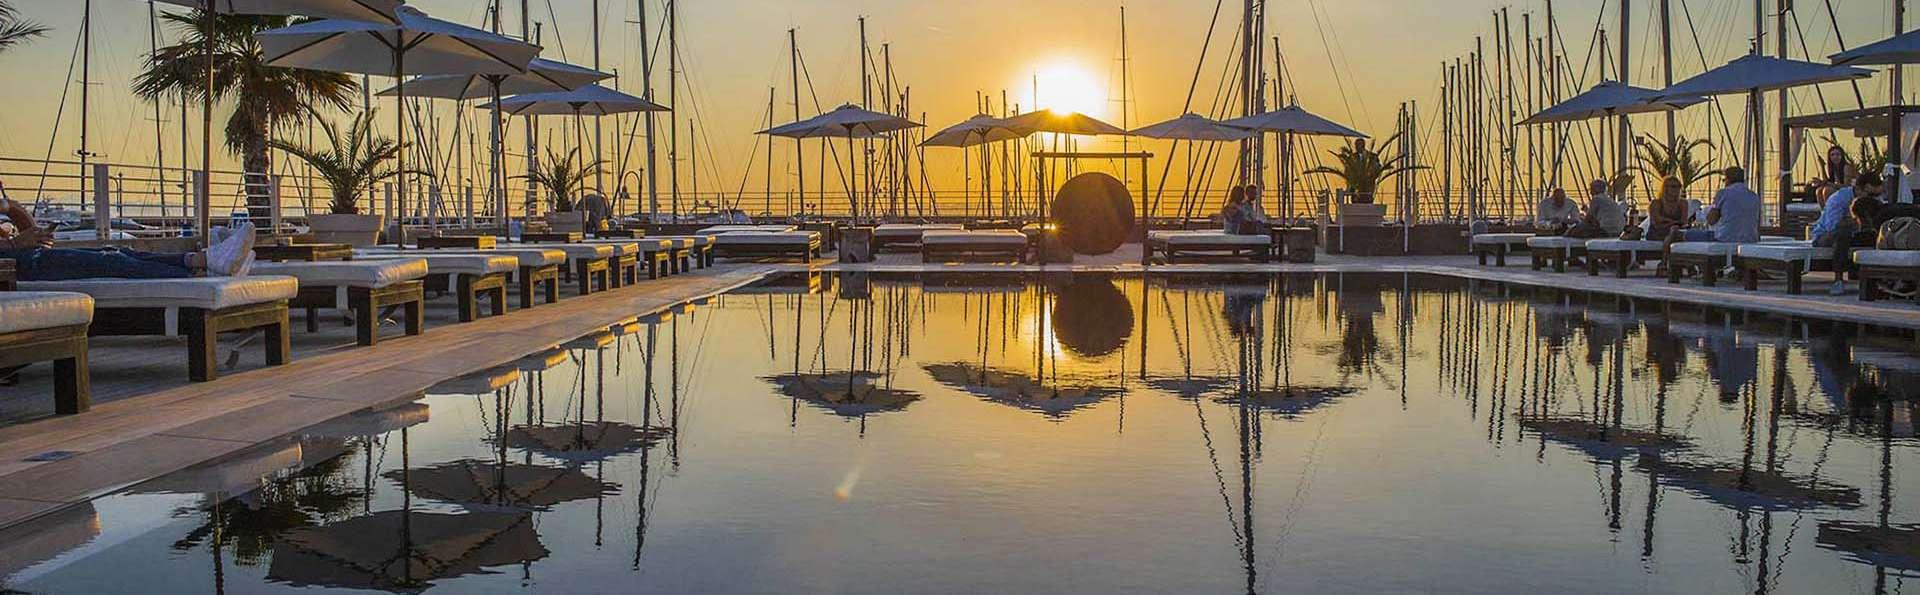 Resort Baia Scarlino - EDIT_POOL_01.jpg